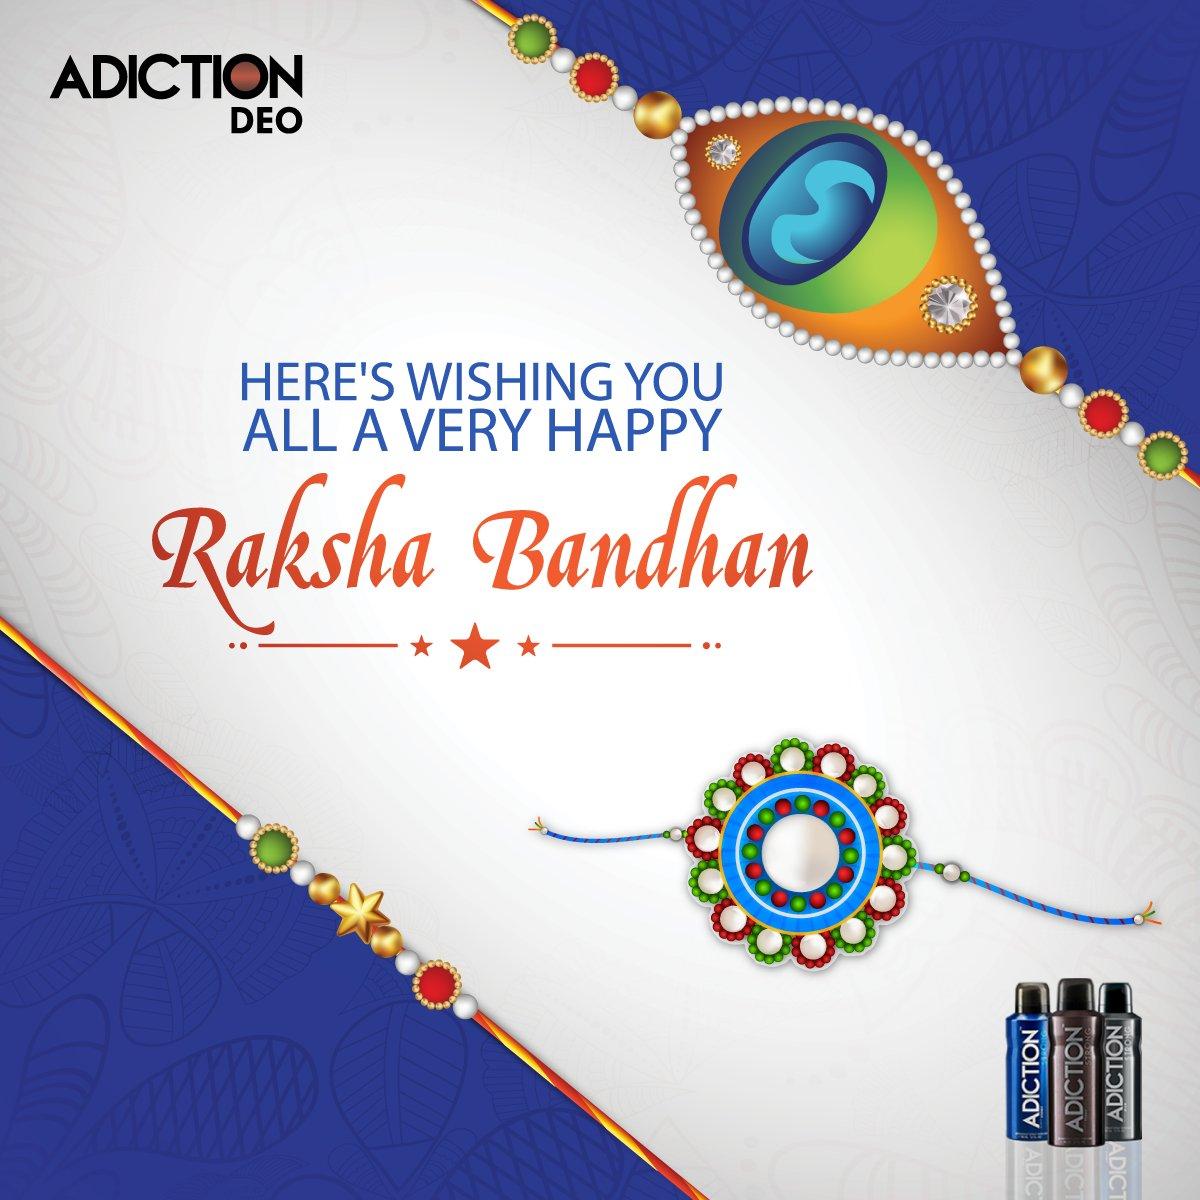 Celebrate this Raksha Bandhan with us. #HappyRakshaBandhan #Rakhi #IndianFestival https://t.co/ZMxuh90gwm